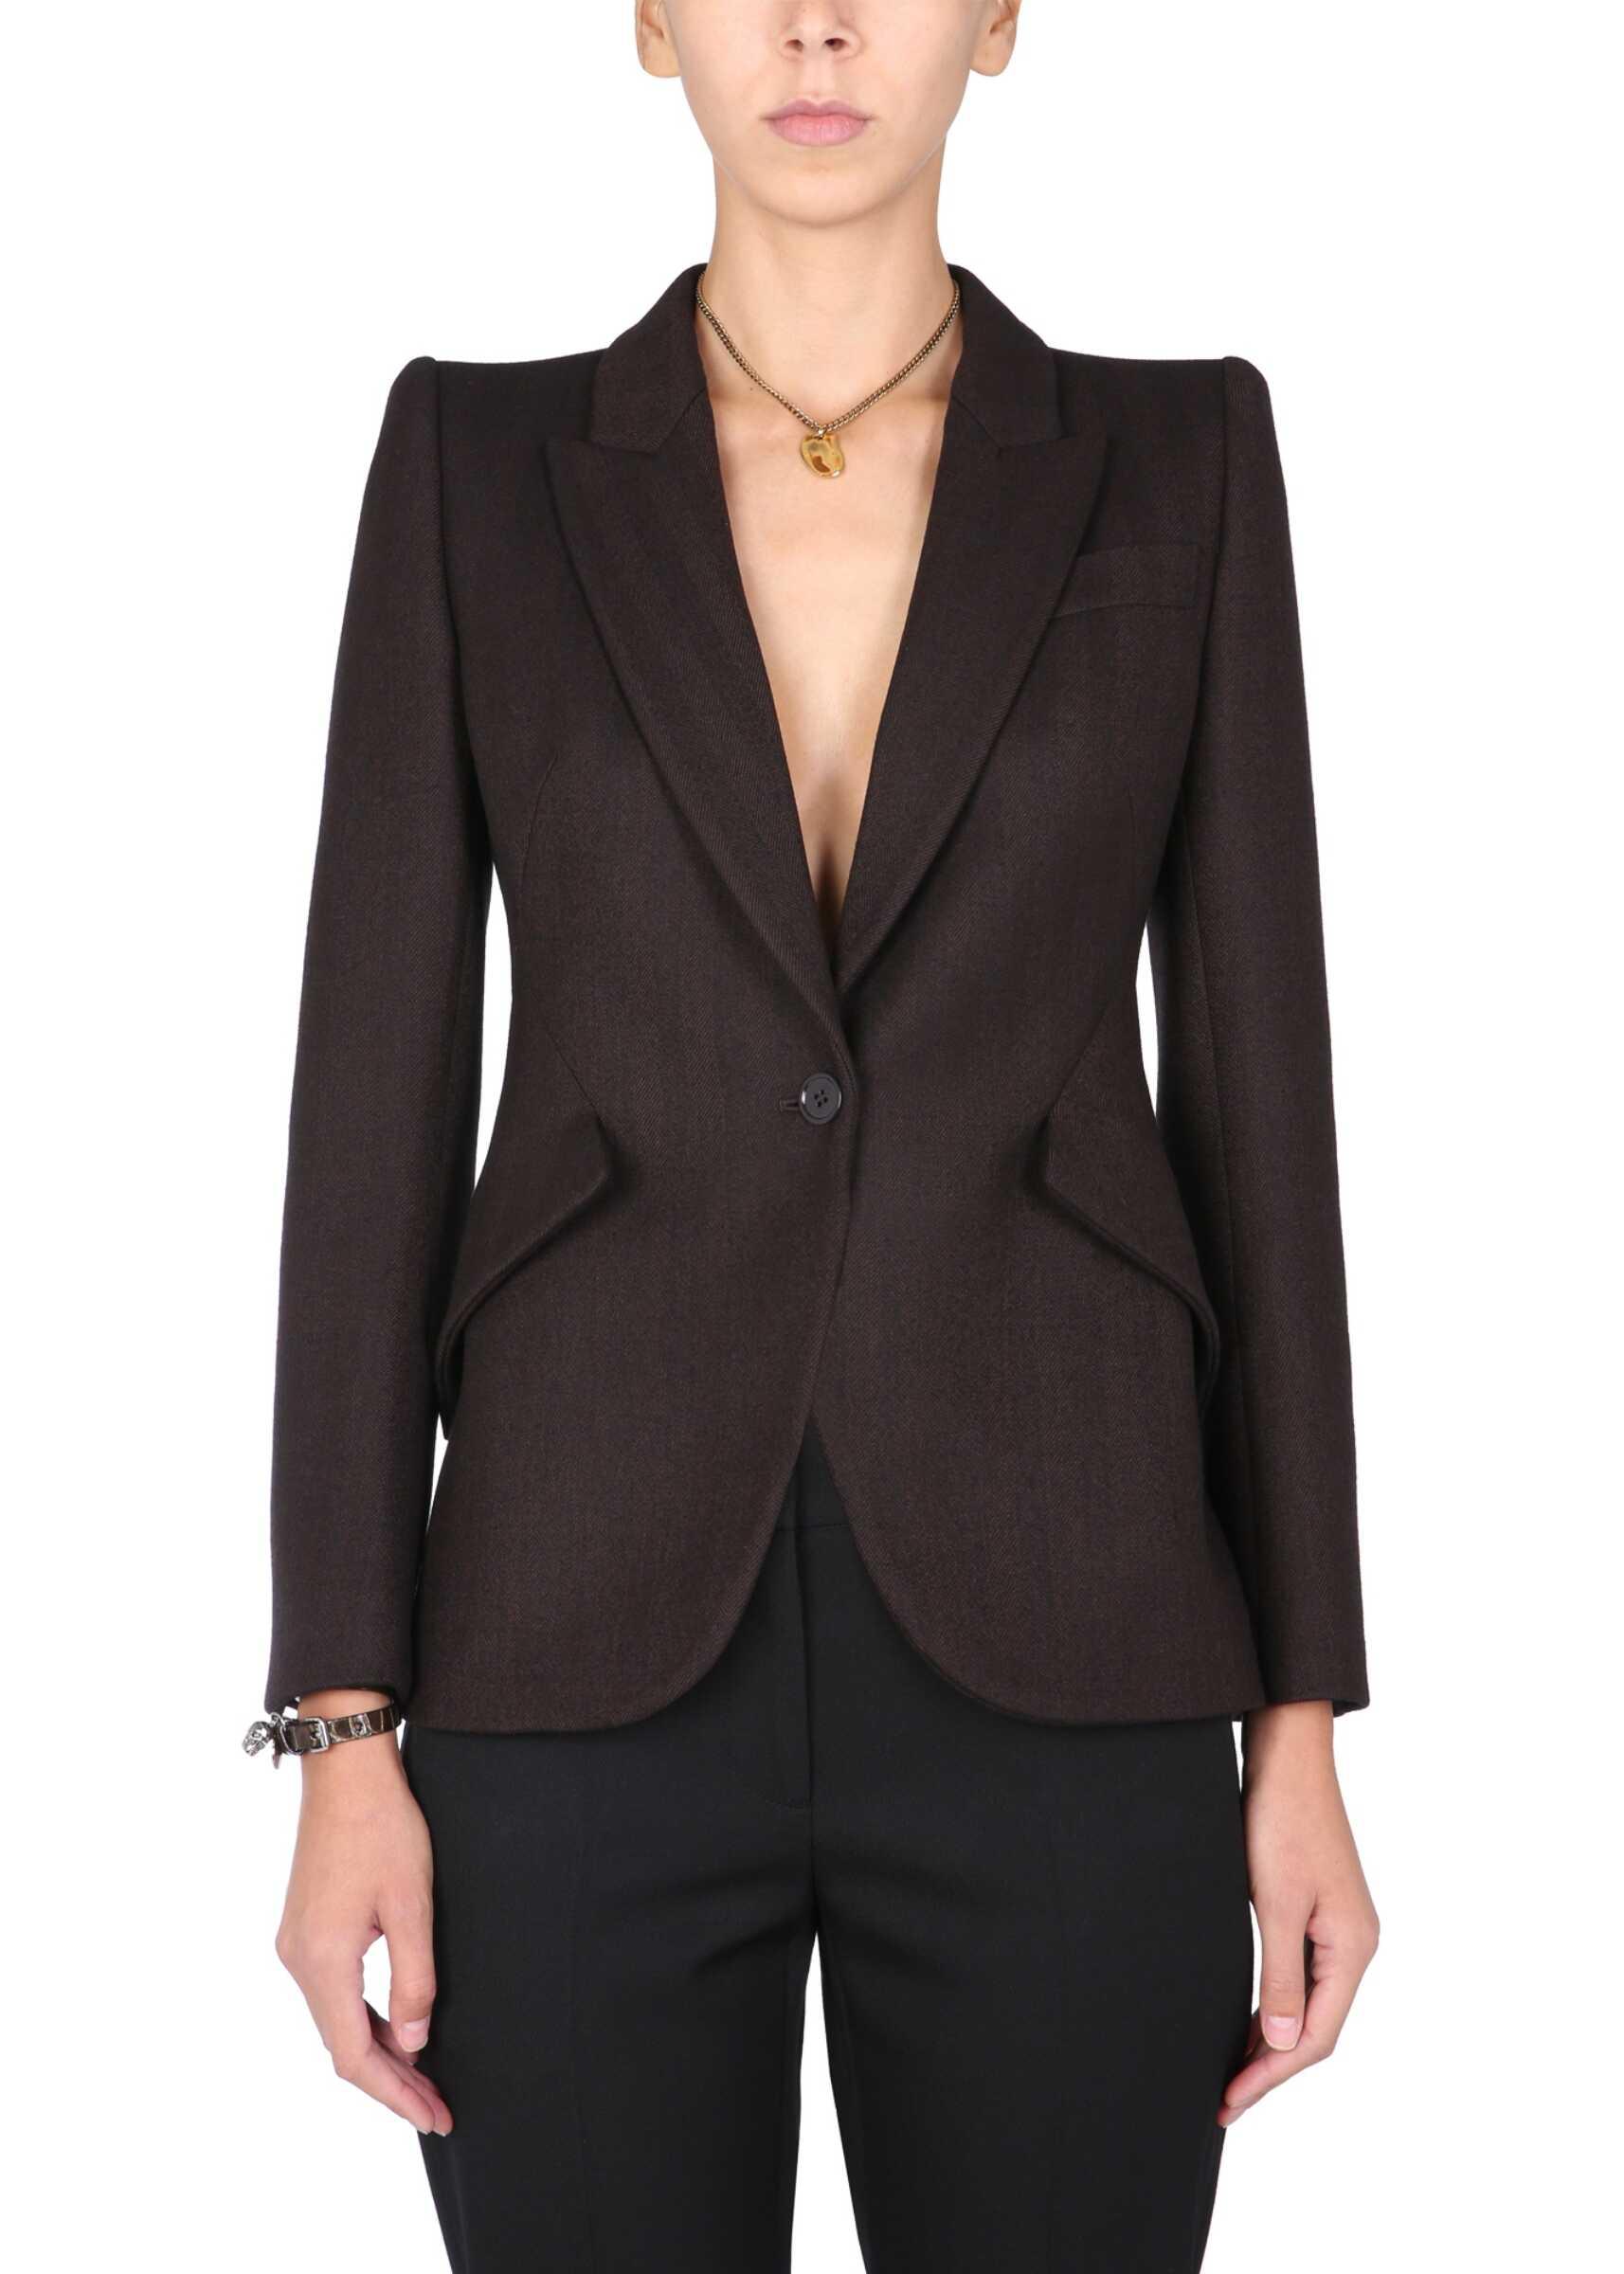 Alexander McQueen Tailored Jacket 585442_QJACG2017 BROWN image0